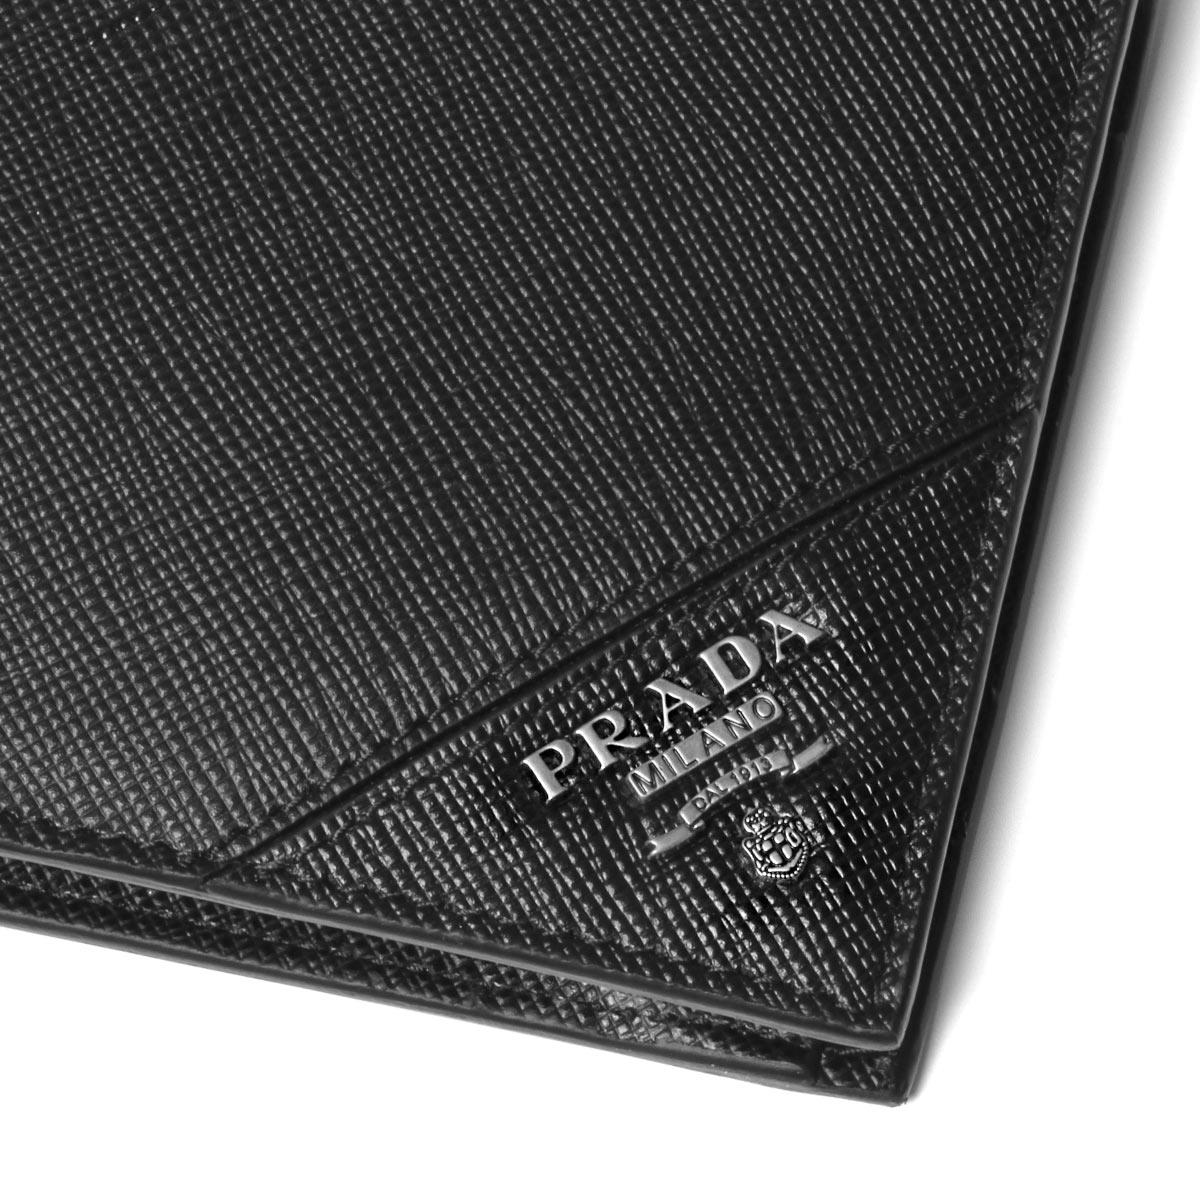 c73076896a1d ... Prada PRADA wallet men 2MO738 QME F0002 folio wallet SAFFIANO METAL  NERO black ...